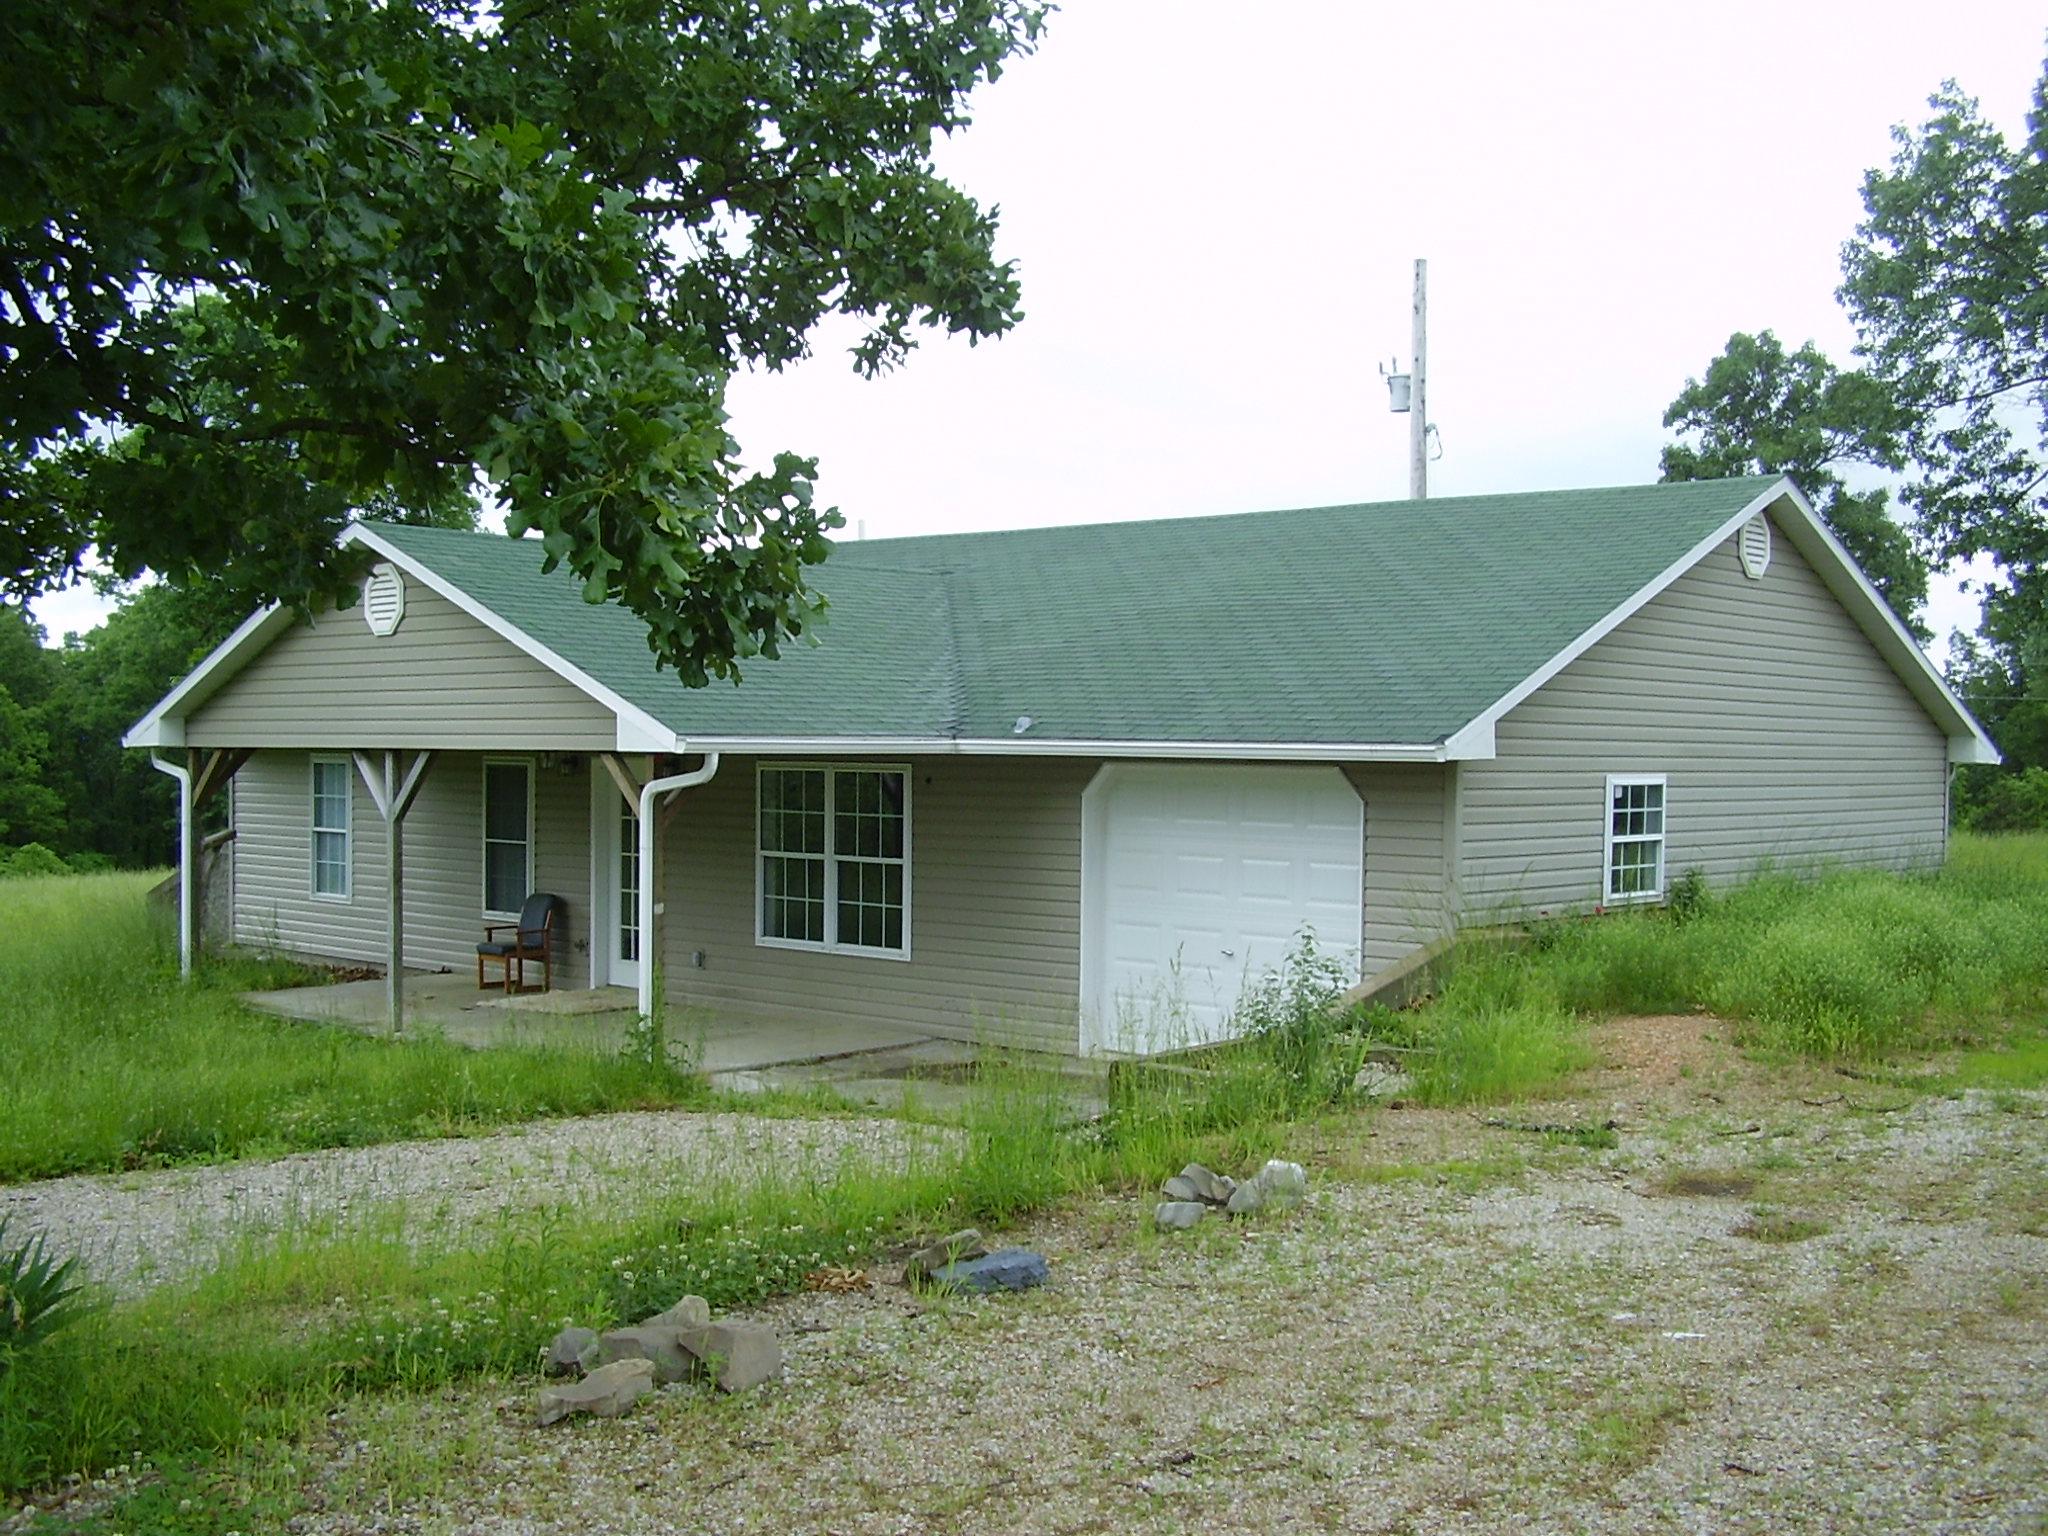 52 Arapaho Macks Creek, MO 65786